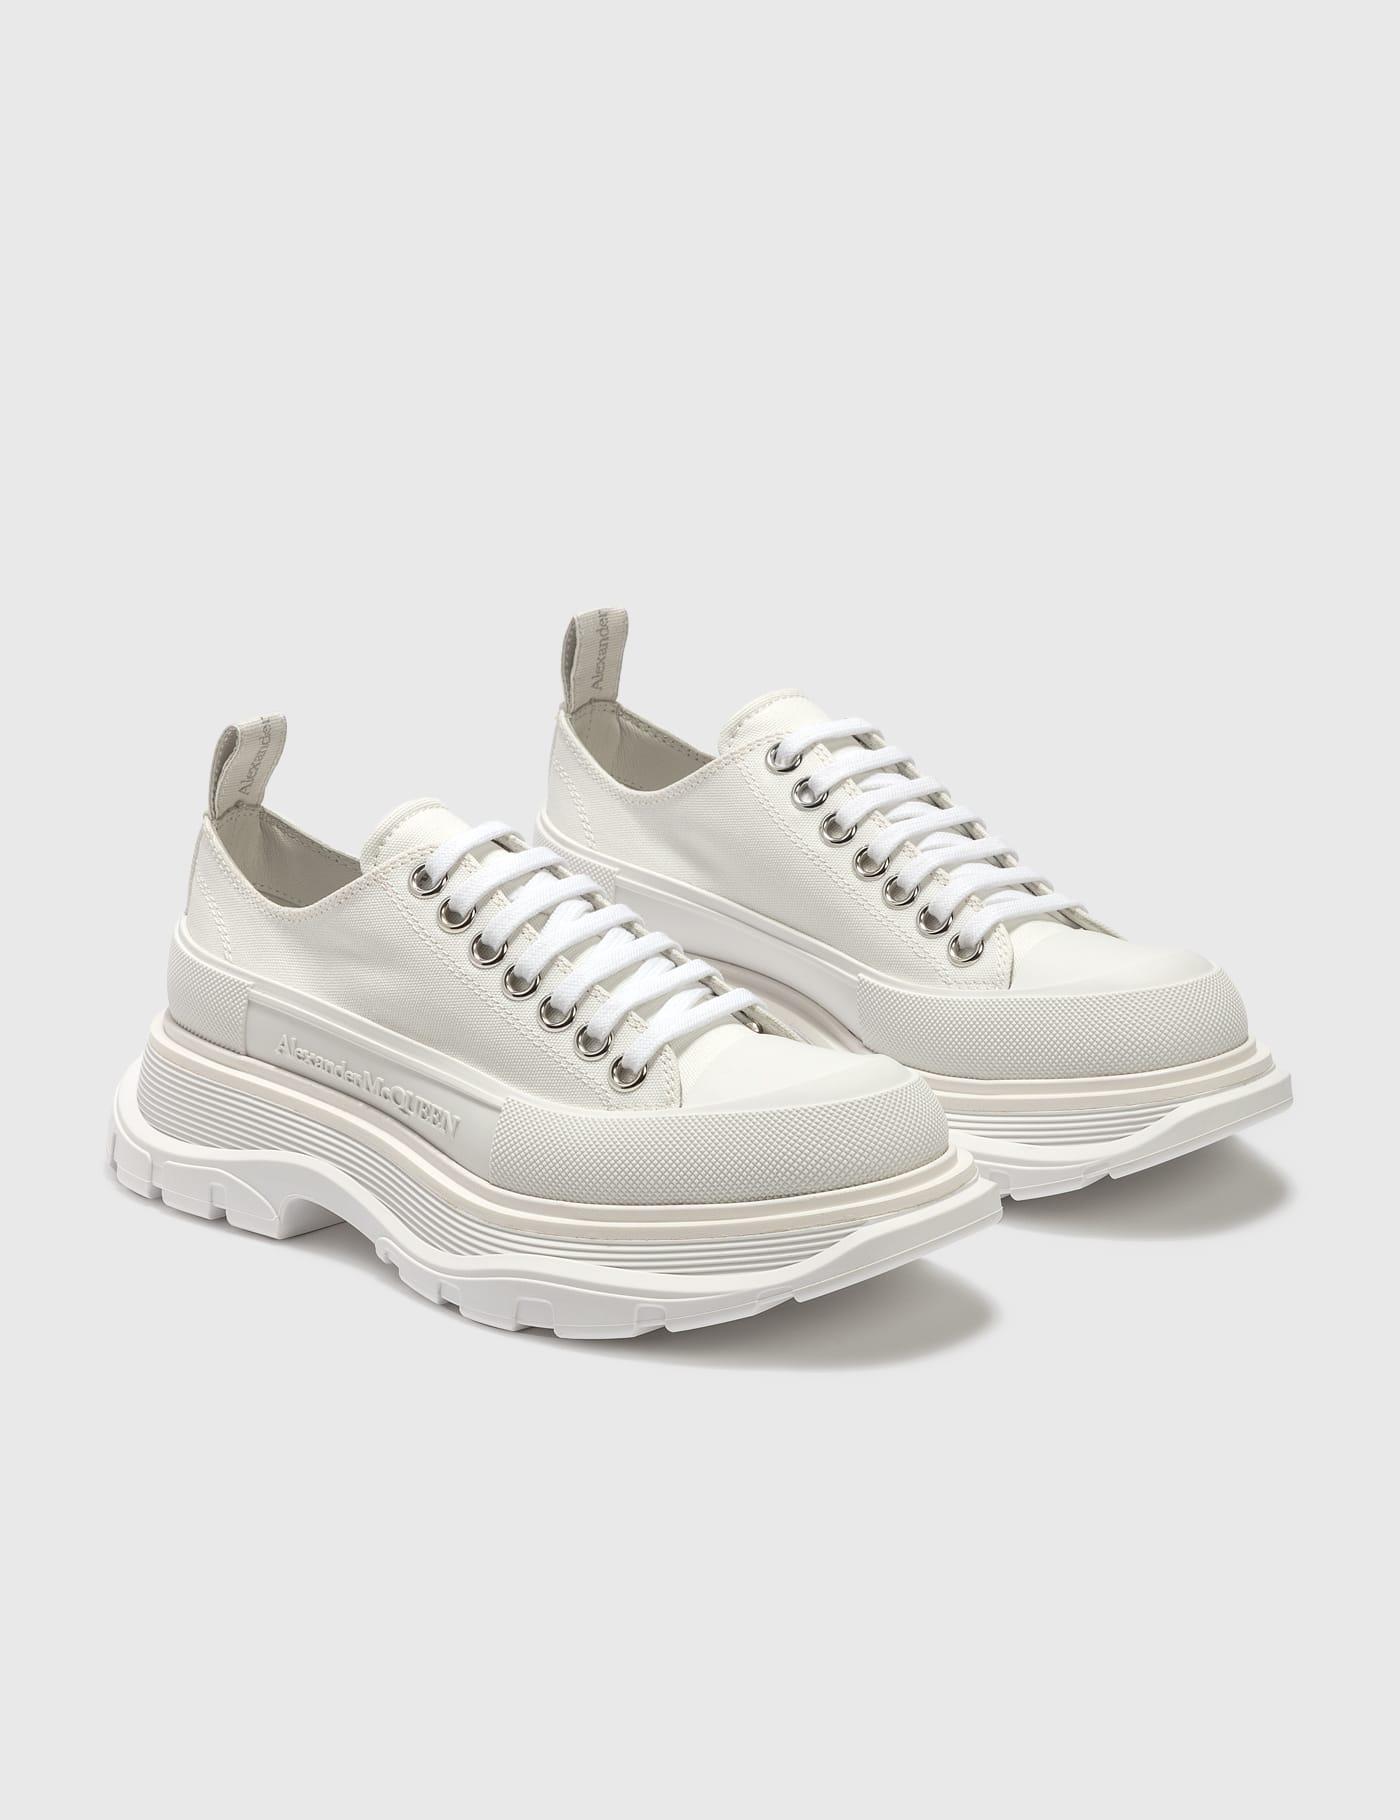 Tread Slick Lace Up Sneaker